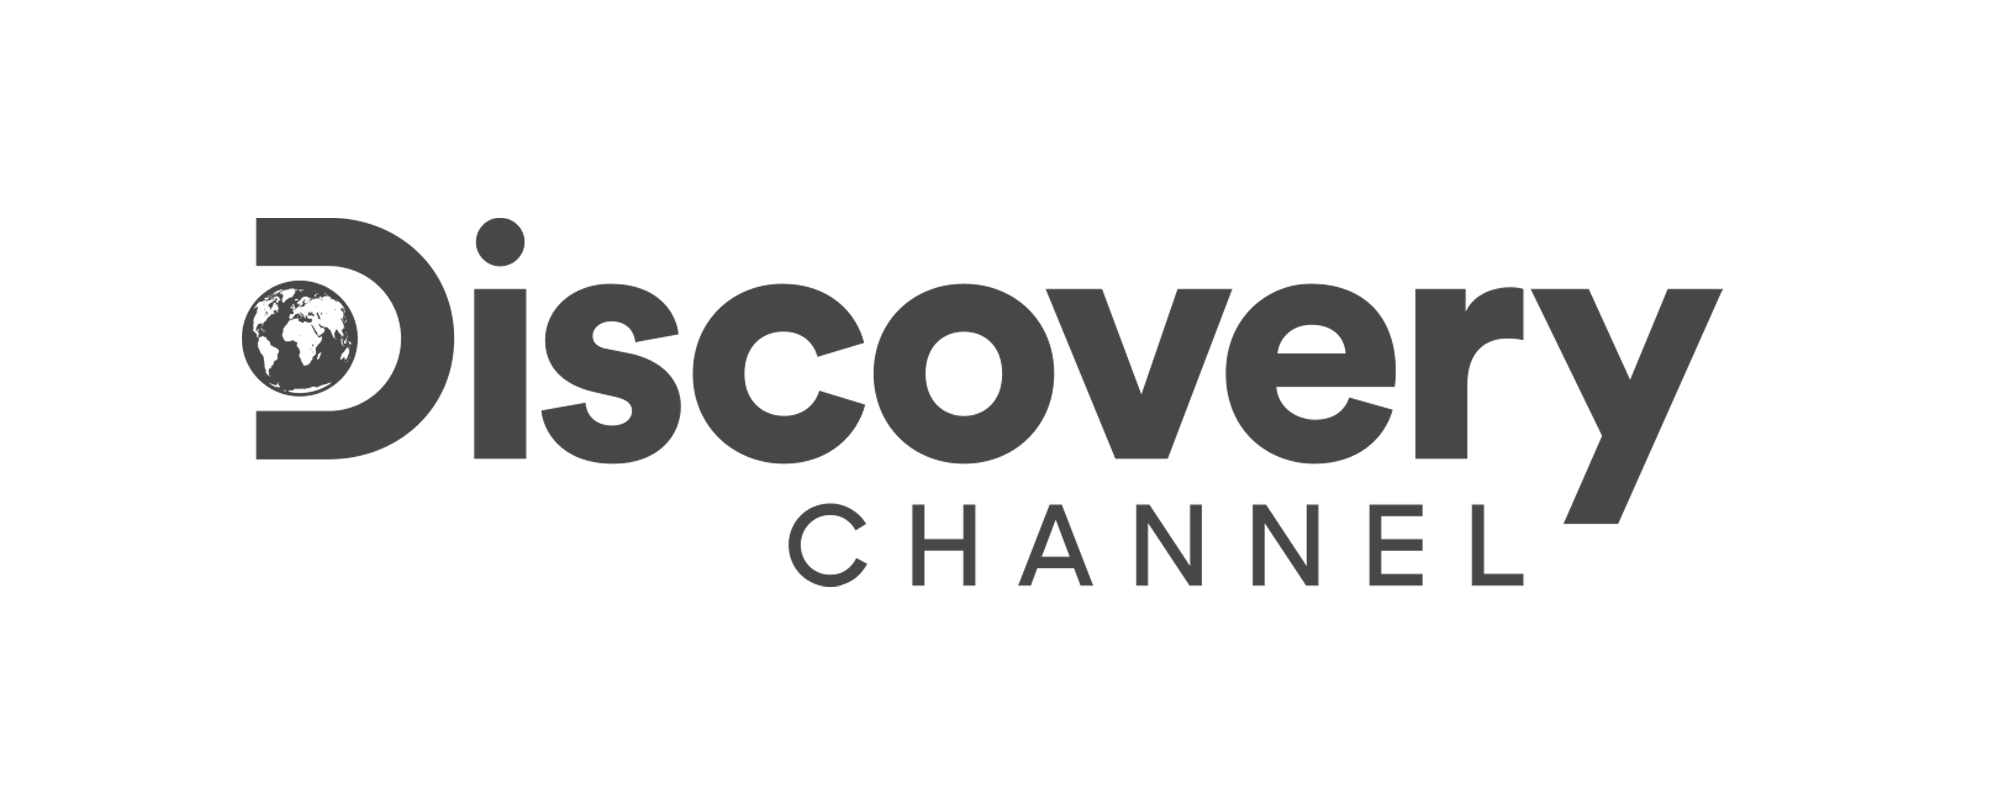 https://www.hybrisonline.se/pub_docs/files/Mer/Logoline_Discovery_20x8.png